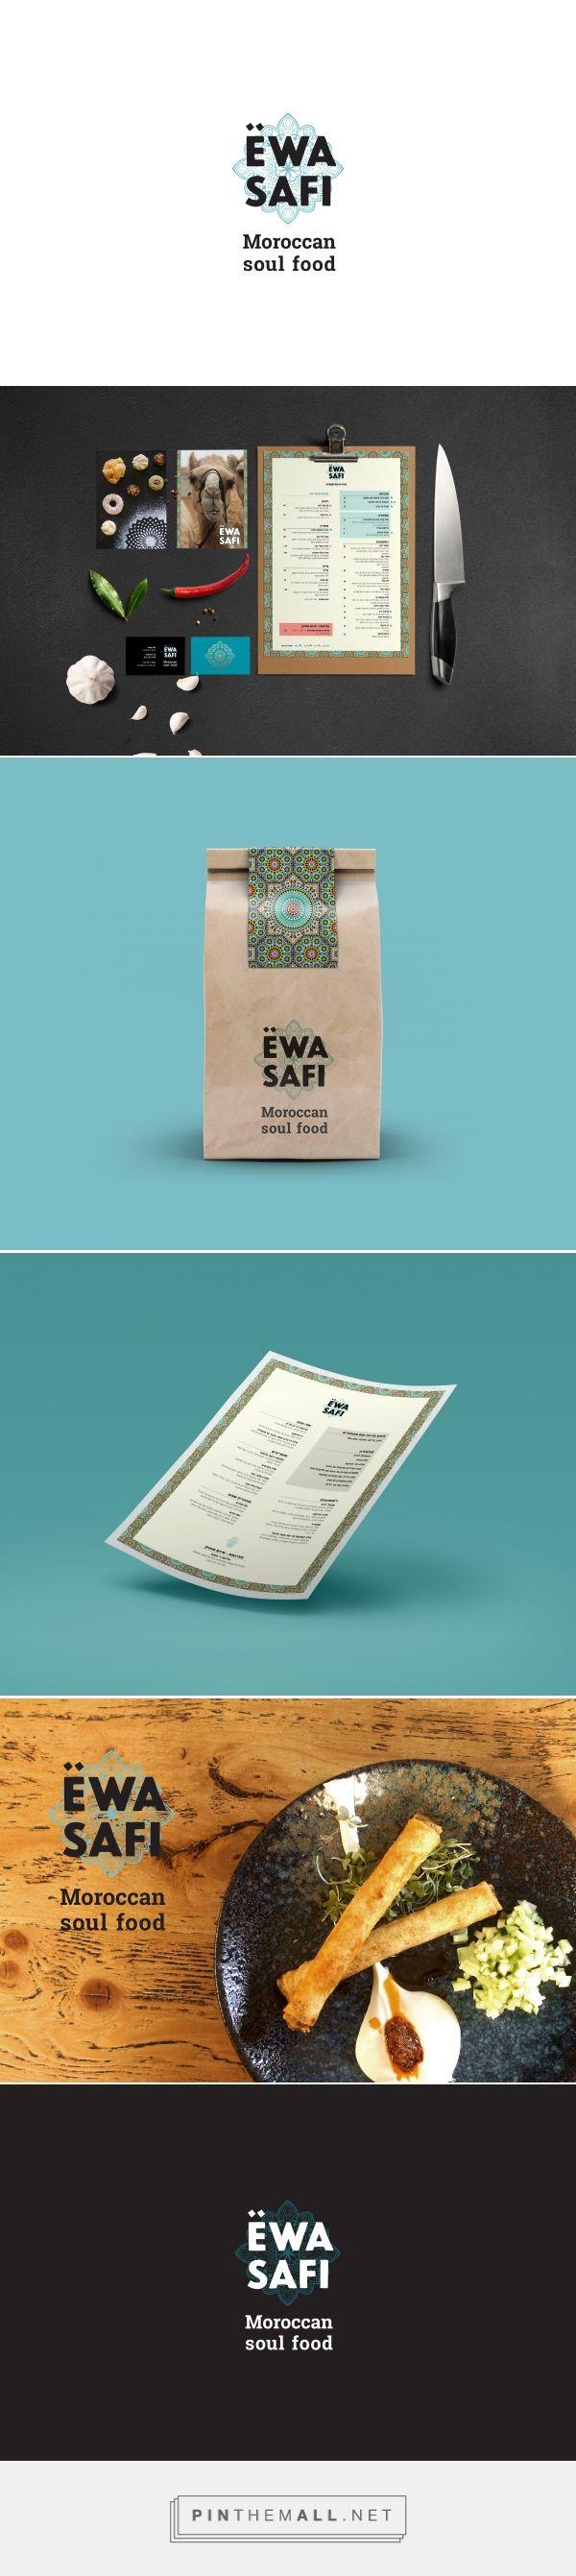 EWA SAFI Moroccan Restaurant Branding by Plan B Creative | Fivestar Branding – Design and Branding Agency & Inspiration Gallery